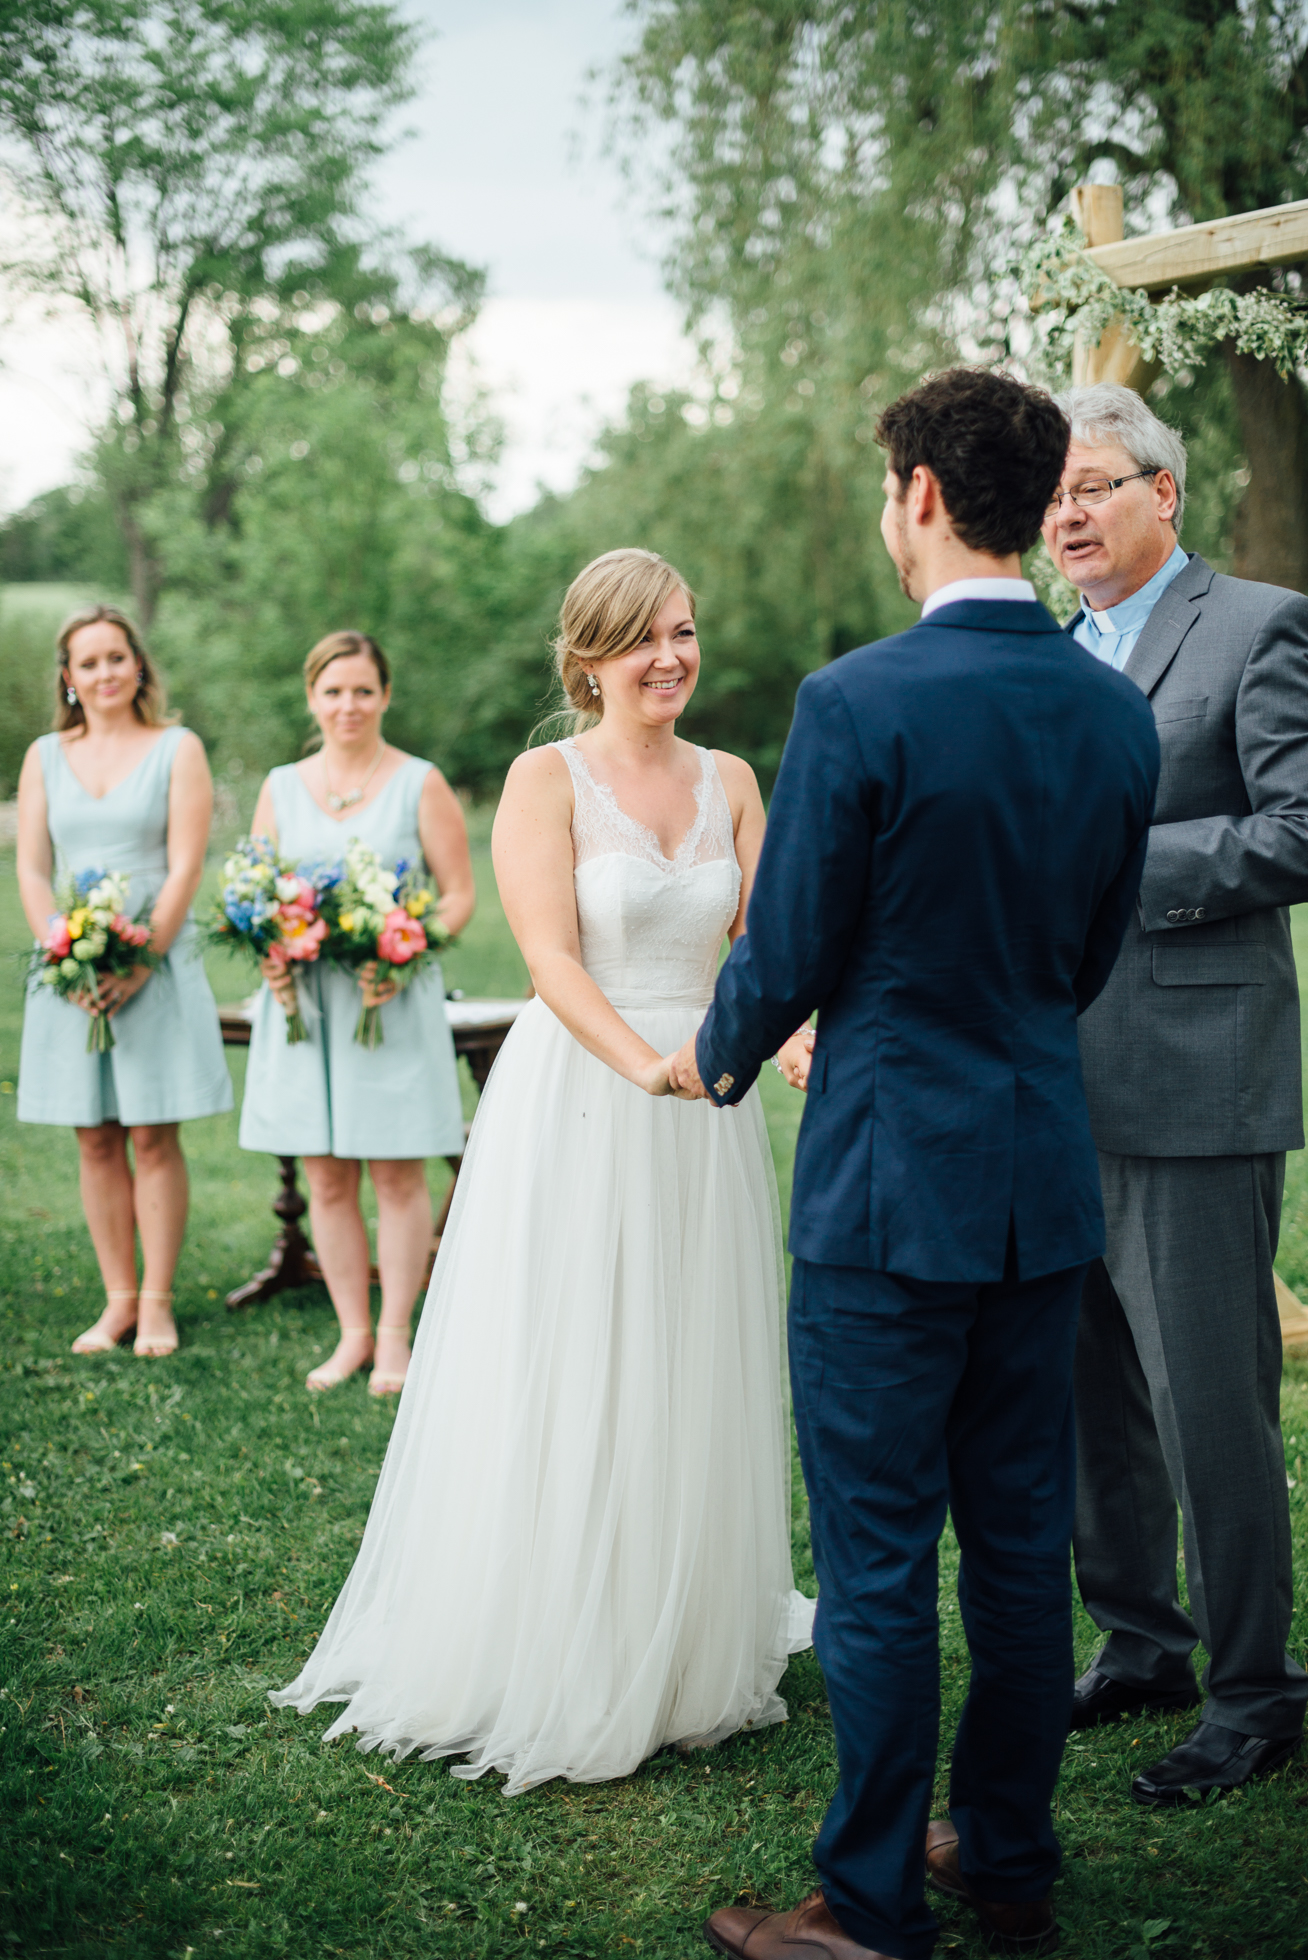 Outdoor-Caledon-Tralee-Wedding-Photography-57